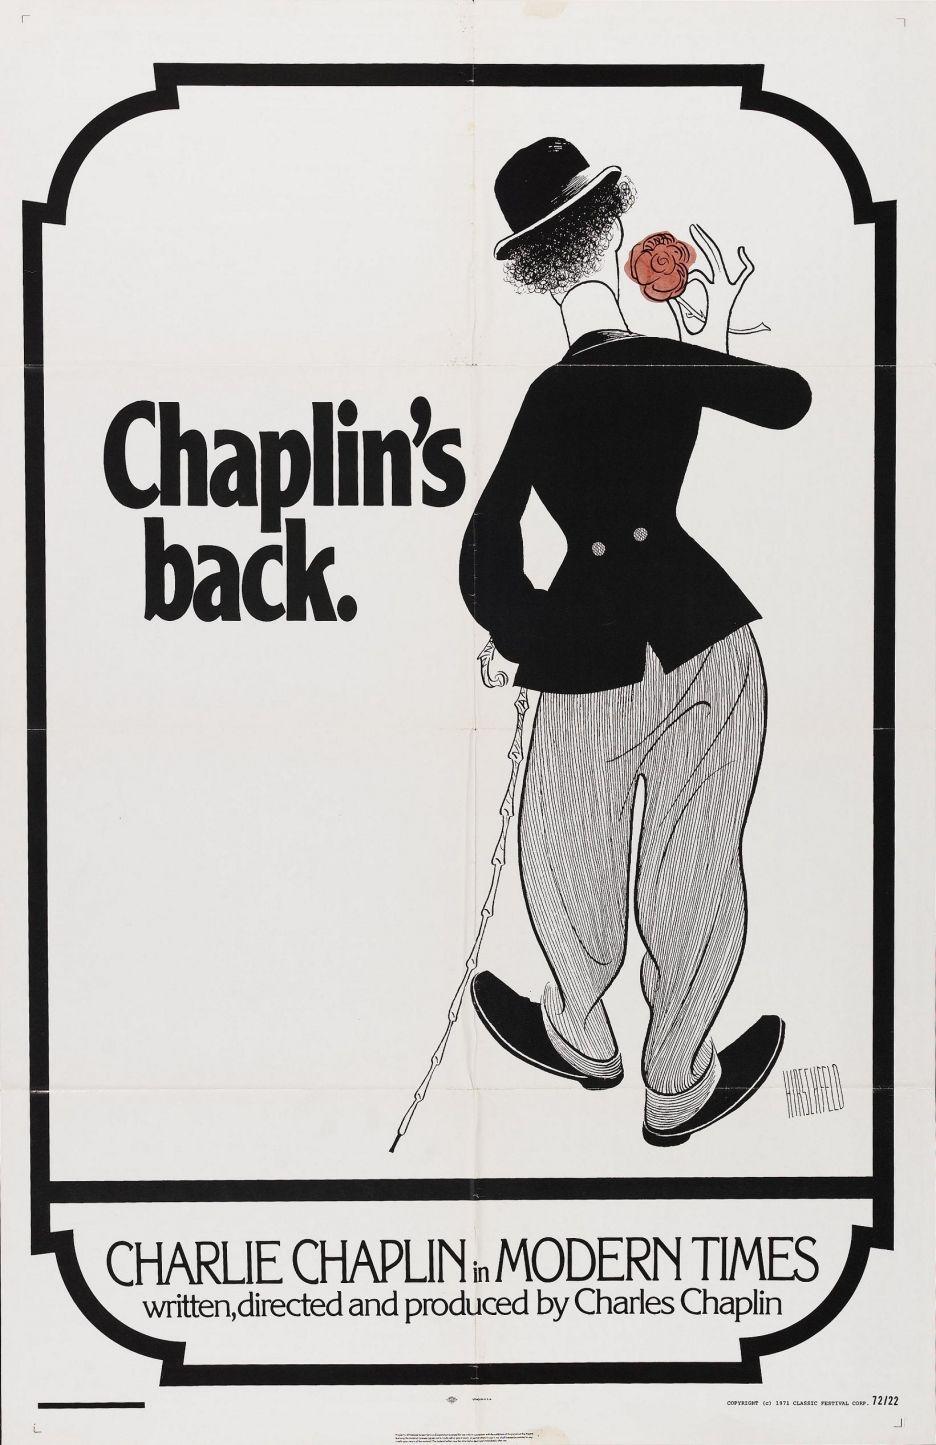 modern Charlie chaplin modern times, Charlie chaplin